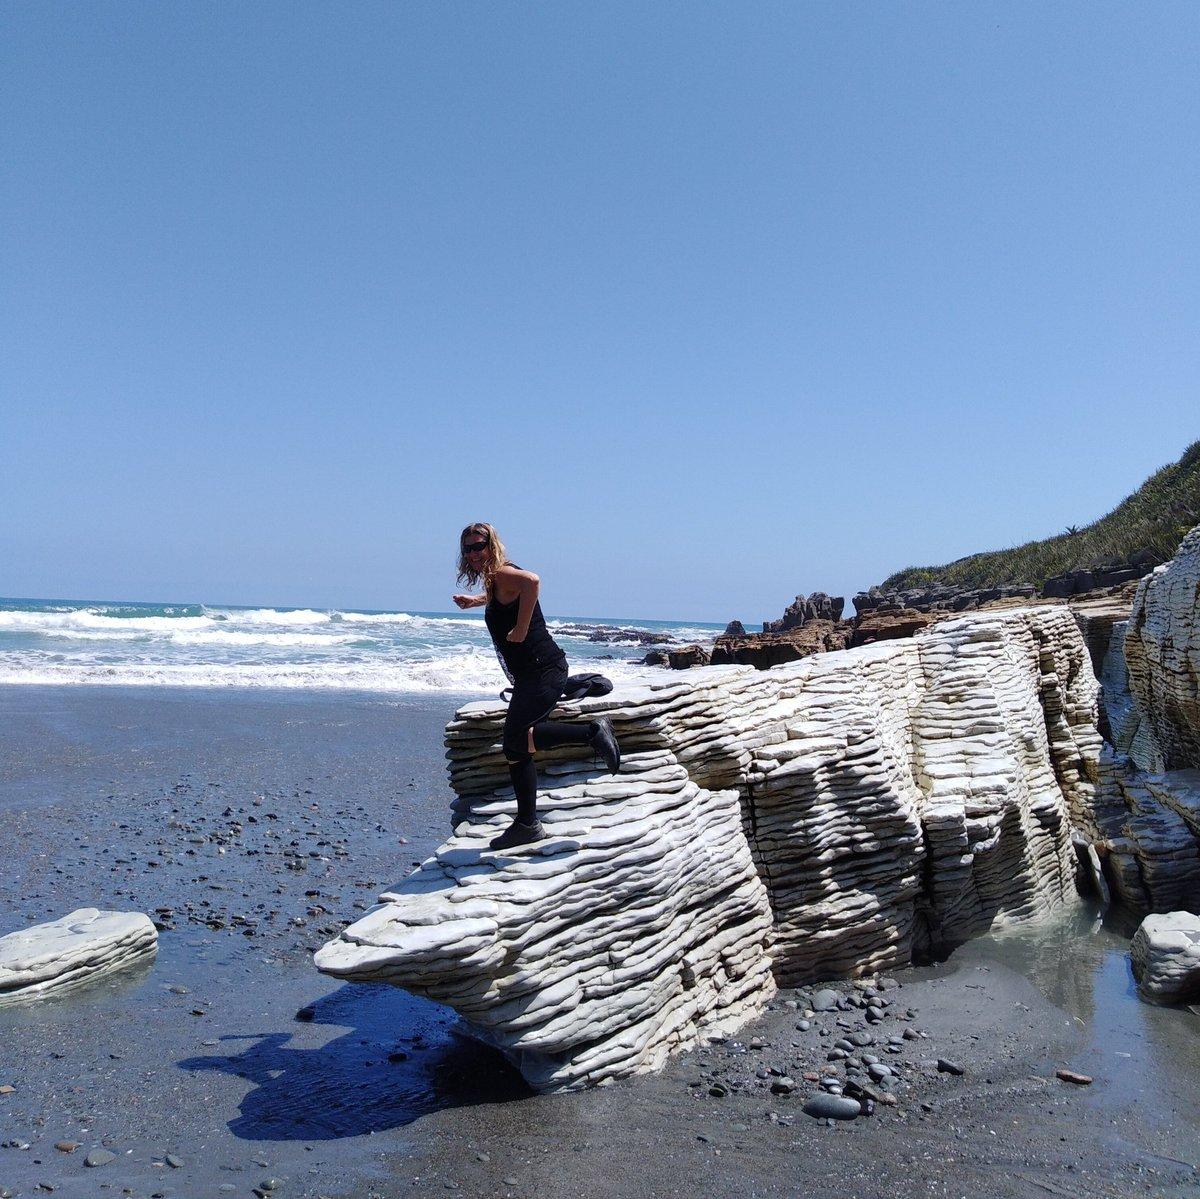 Welcome to #FlashbackFridayz 🥳 This weeks theme is #Rocks & #Stones Tweet your pics with the hashtag #FlashbackFridayz Tag & Retweet hosts @TravelBugsWorld @carpediemeire @Adventuringgal +guests hosts @AOAOxymoron @miriandmargo Tag Mates, Share Fun! 📸Pancake Rocks #NewZealand